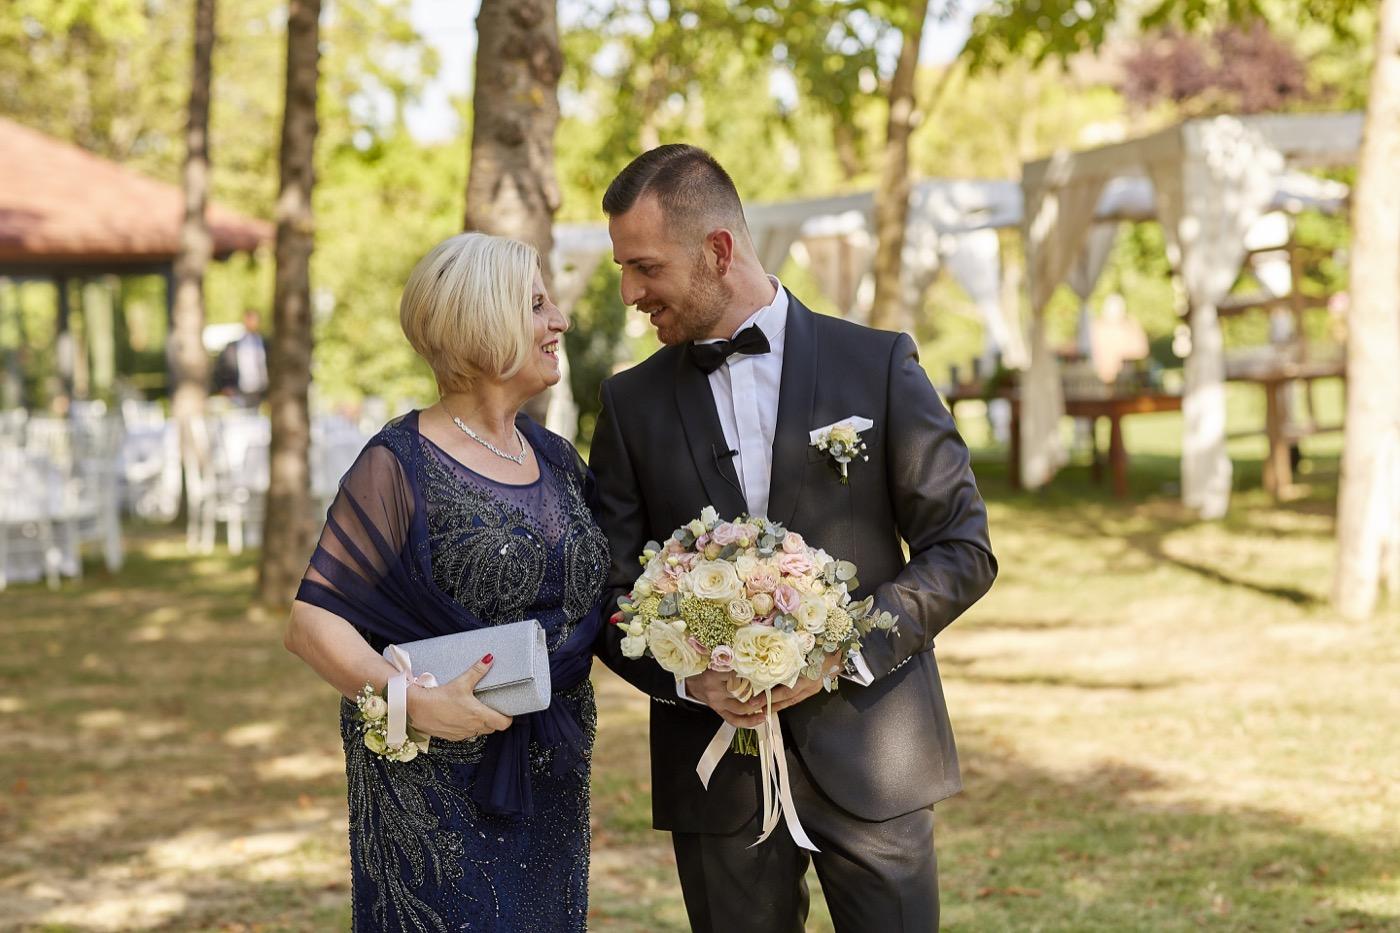 Claudio-Coppola-wedding-photographer-la-scuderia-eventi-preparativi-la-rosetta-perugia-41